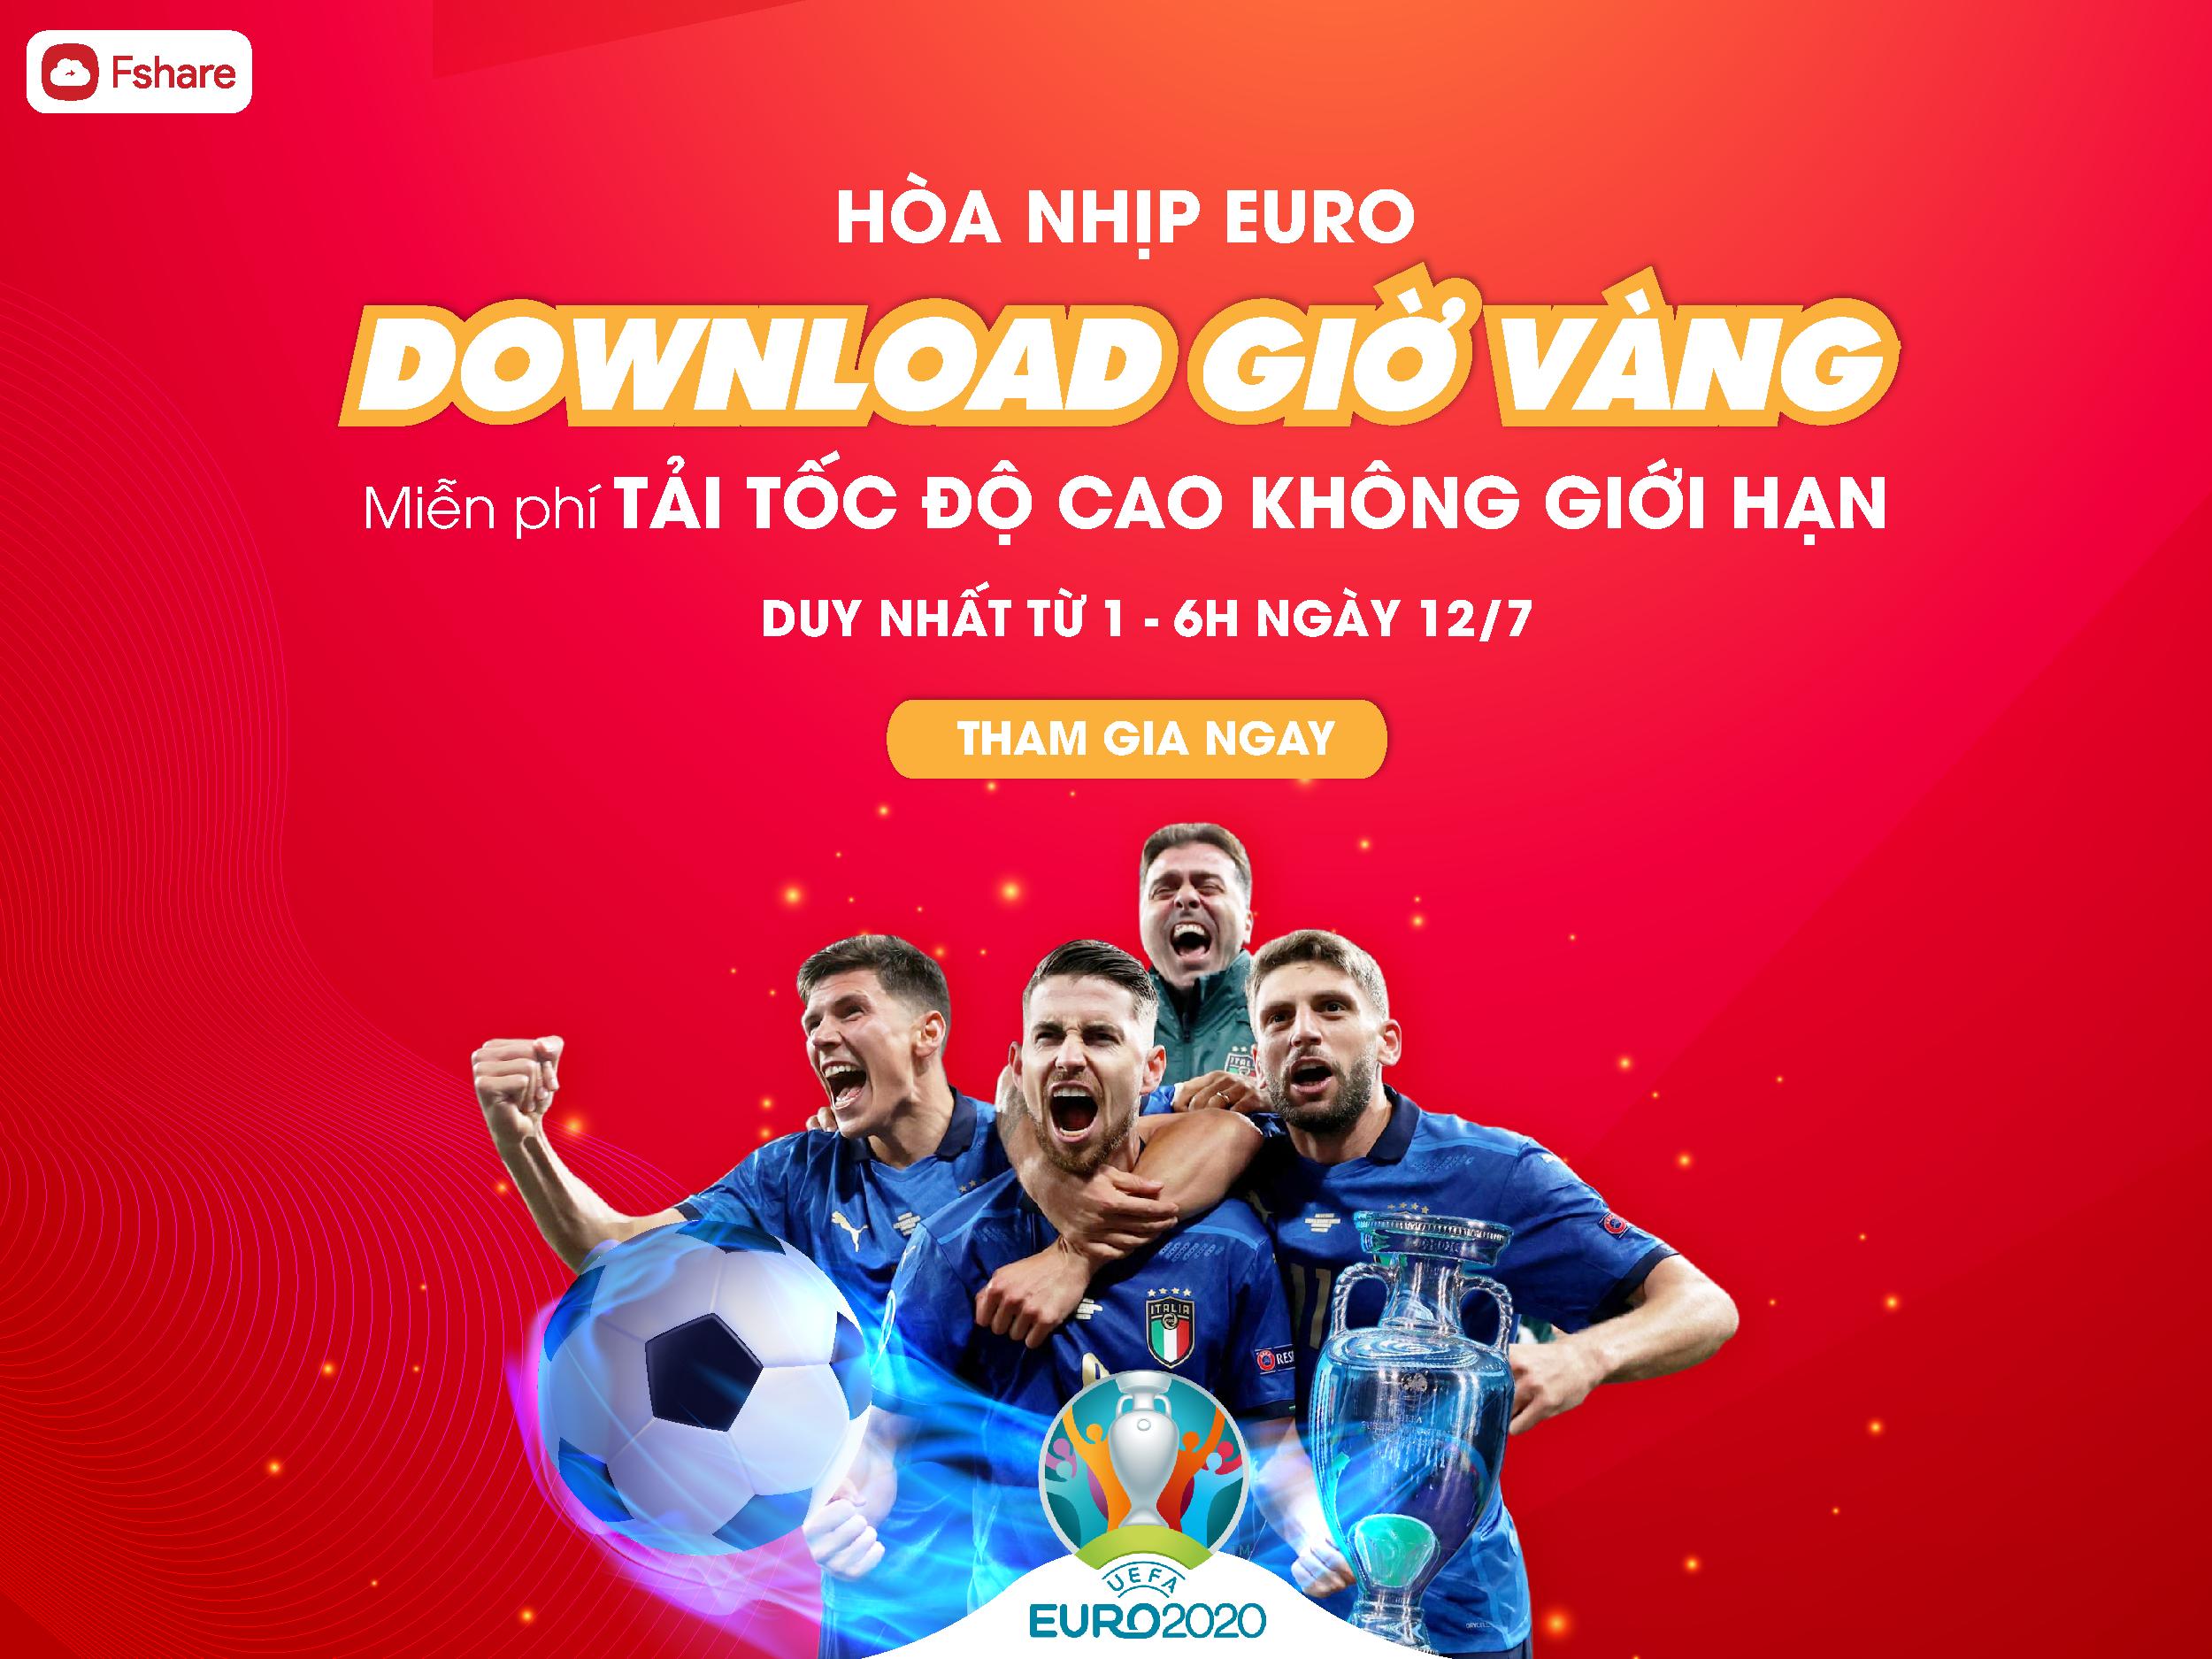 Fshare Download gio vang